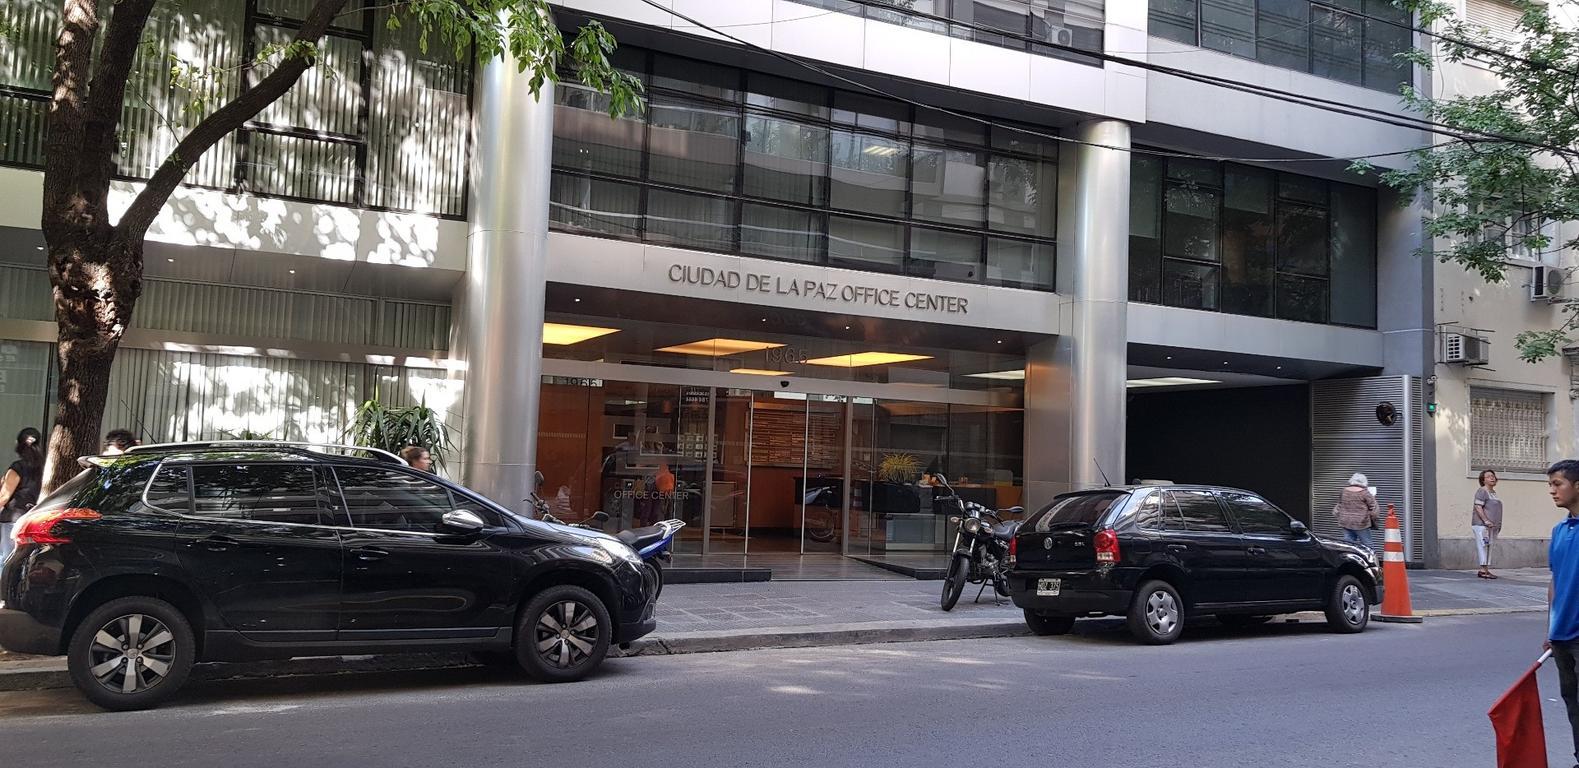 Oficina Edificio Premium Frente 2 Cocheras fijas cubiertas